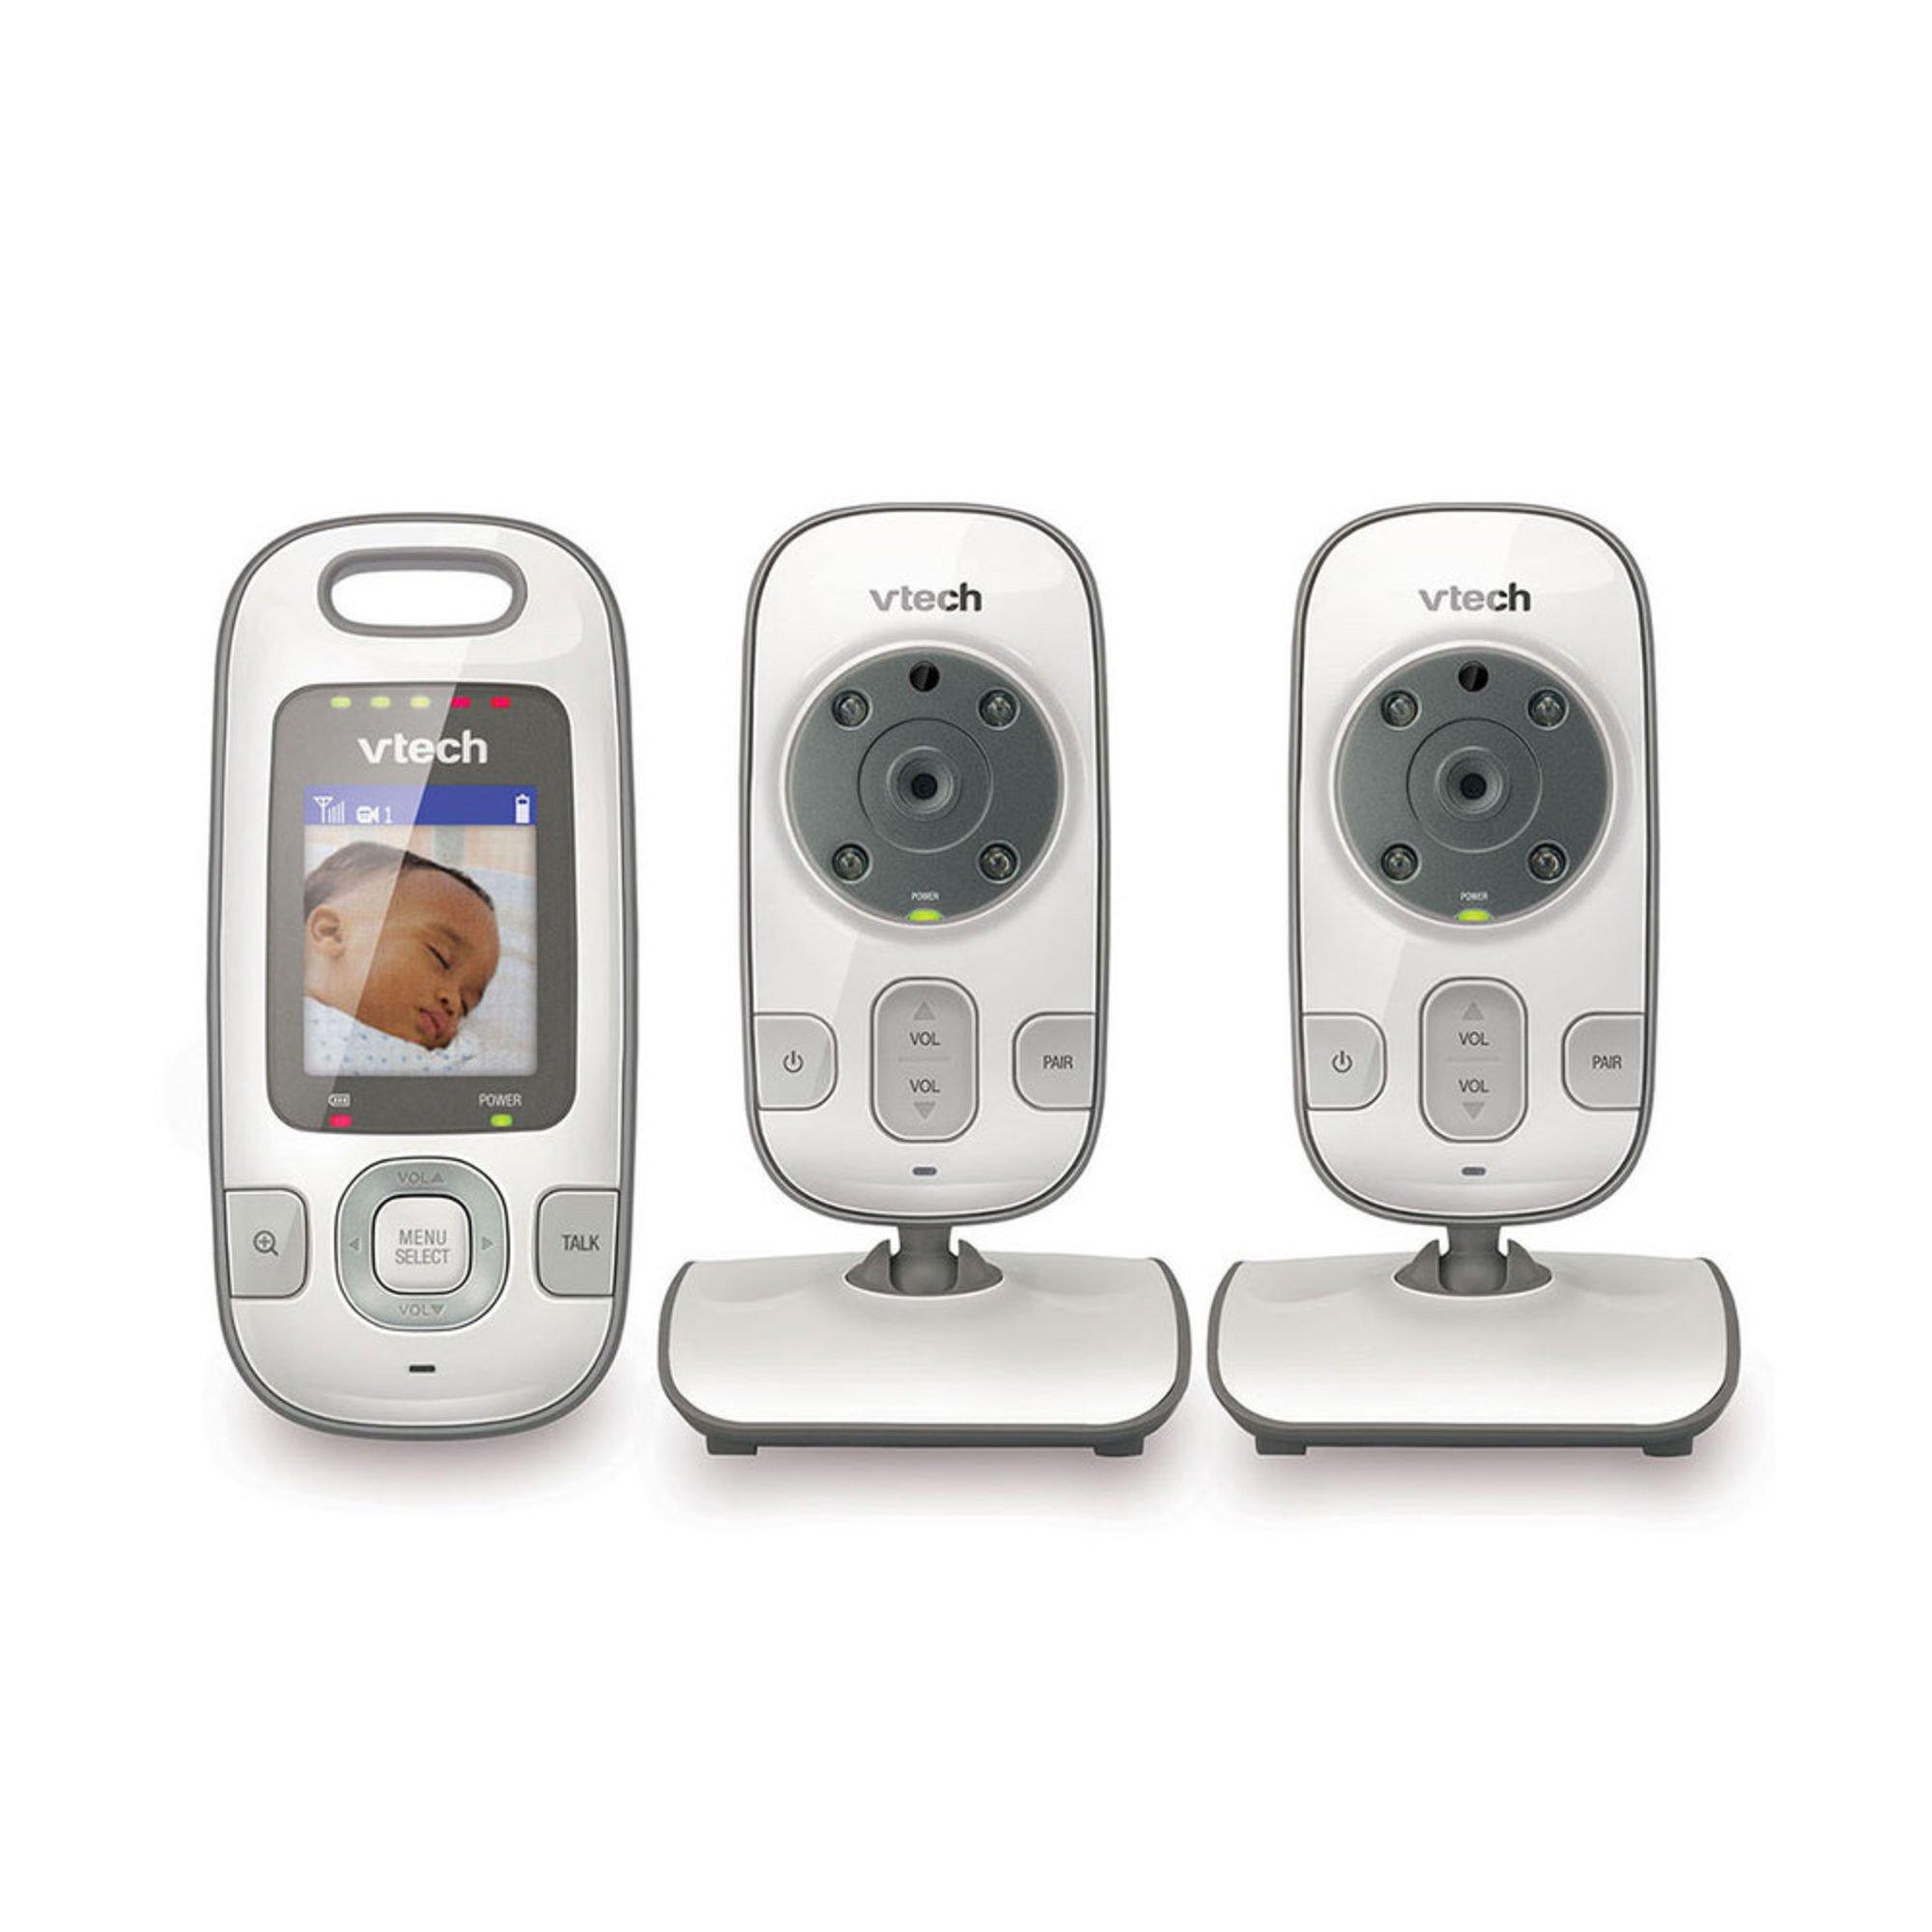 vtech safe sound full color video baby monitor 2 cameras video baby monitors baby kids. Black Bedroom Furniture Sets. Home Design Ideas